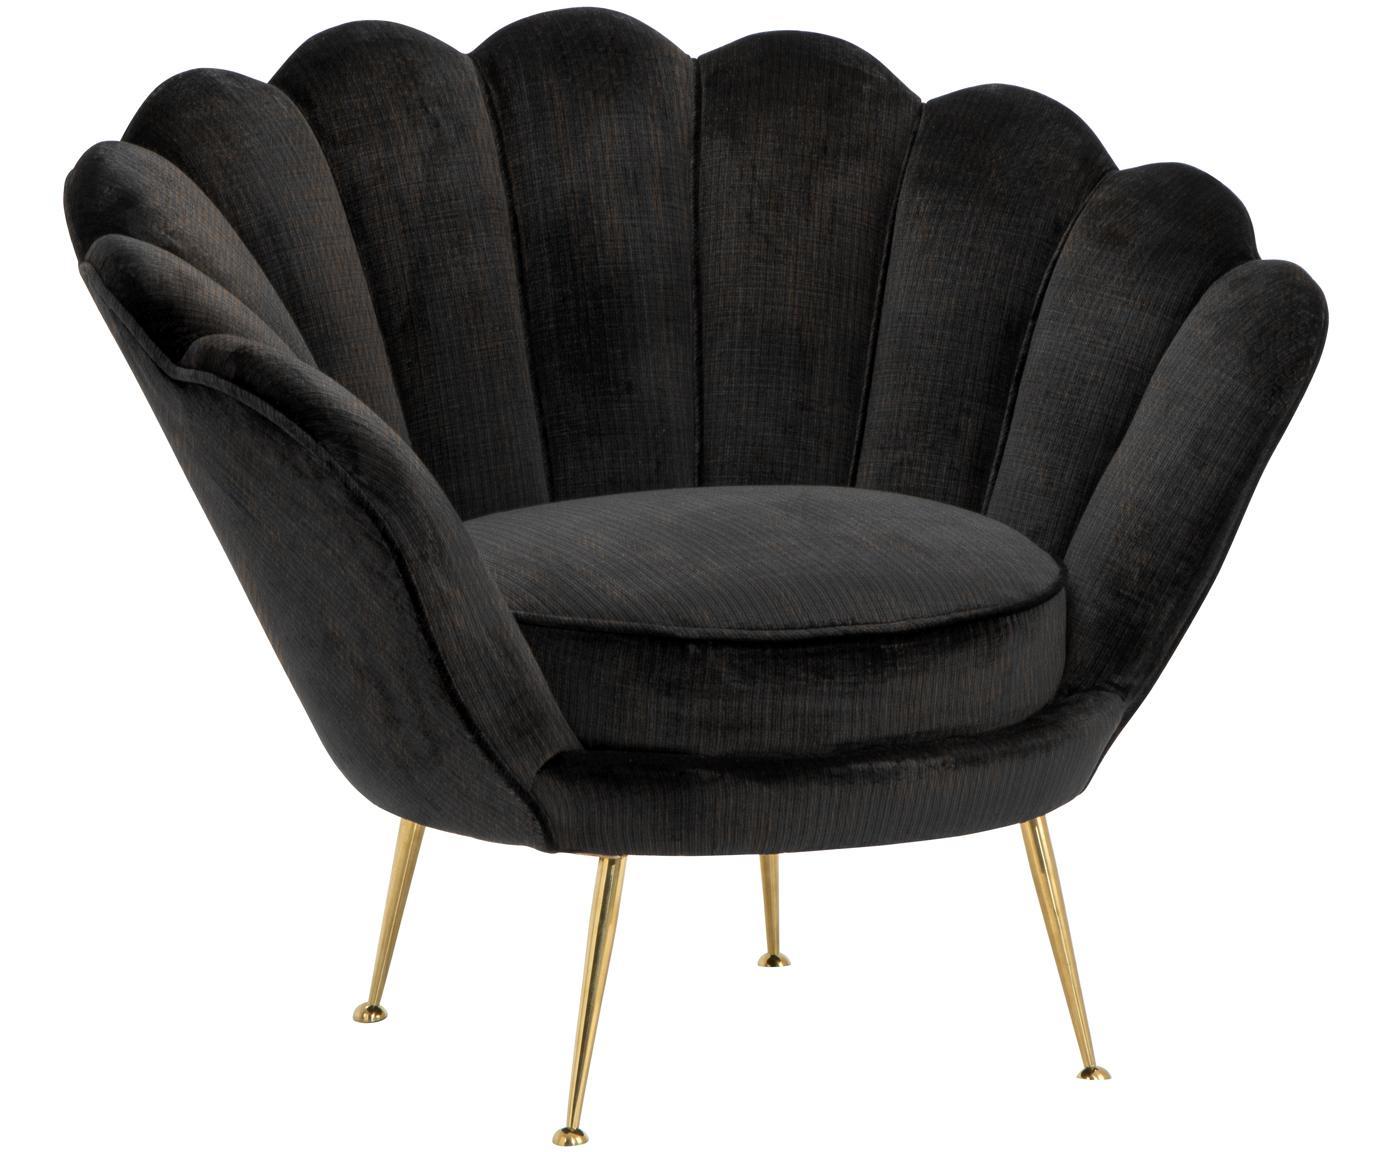 Fluwelen fauteuil Trapezium, Bekleding: 70% viscose, 30% polyeste, Poten: gecoat metaal, Zwart, messingkleurig, B 97 x D 79 cm